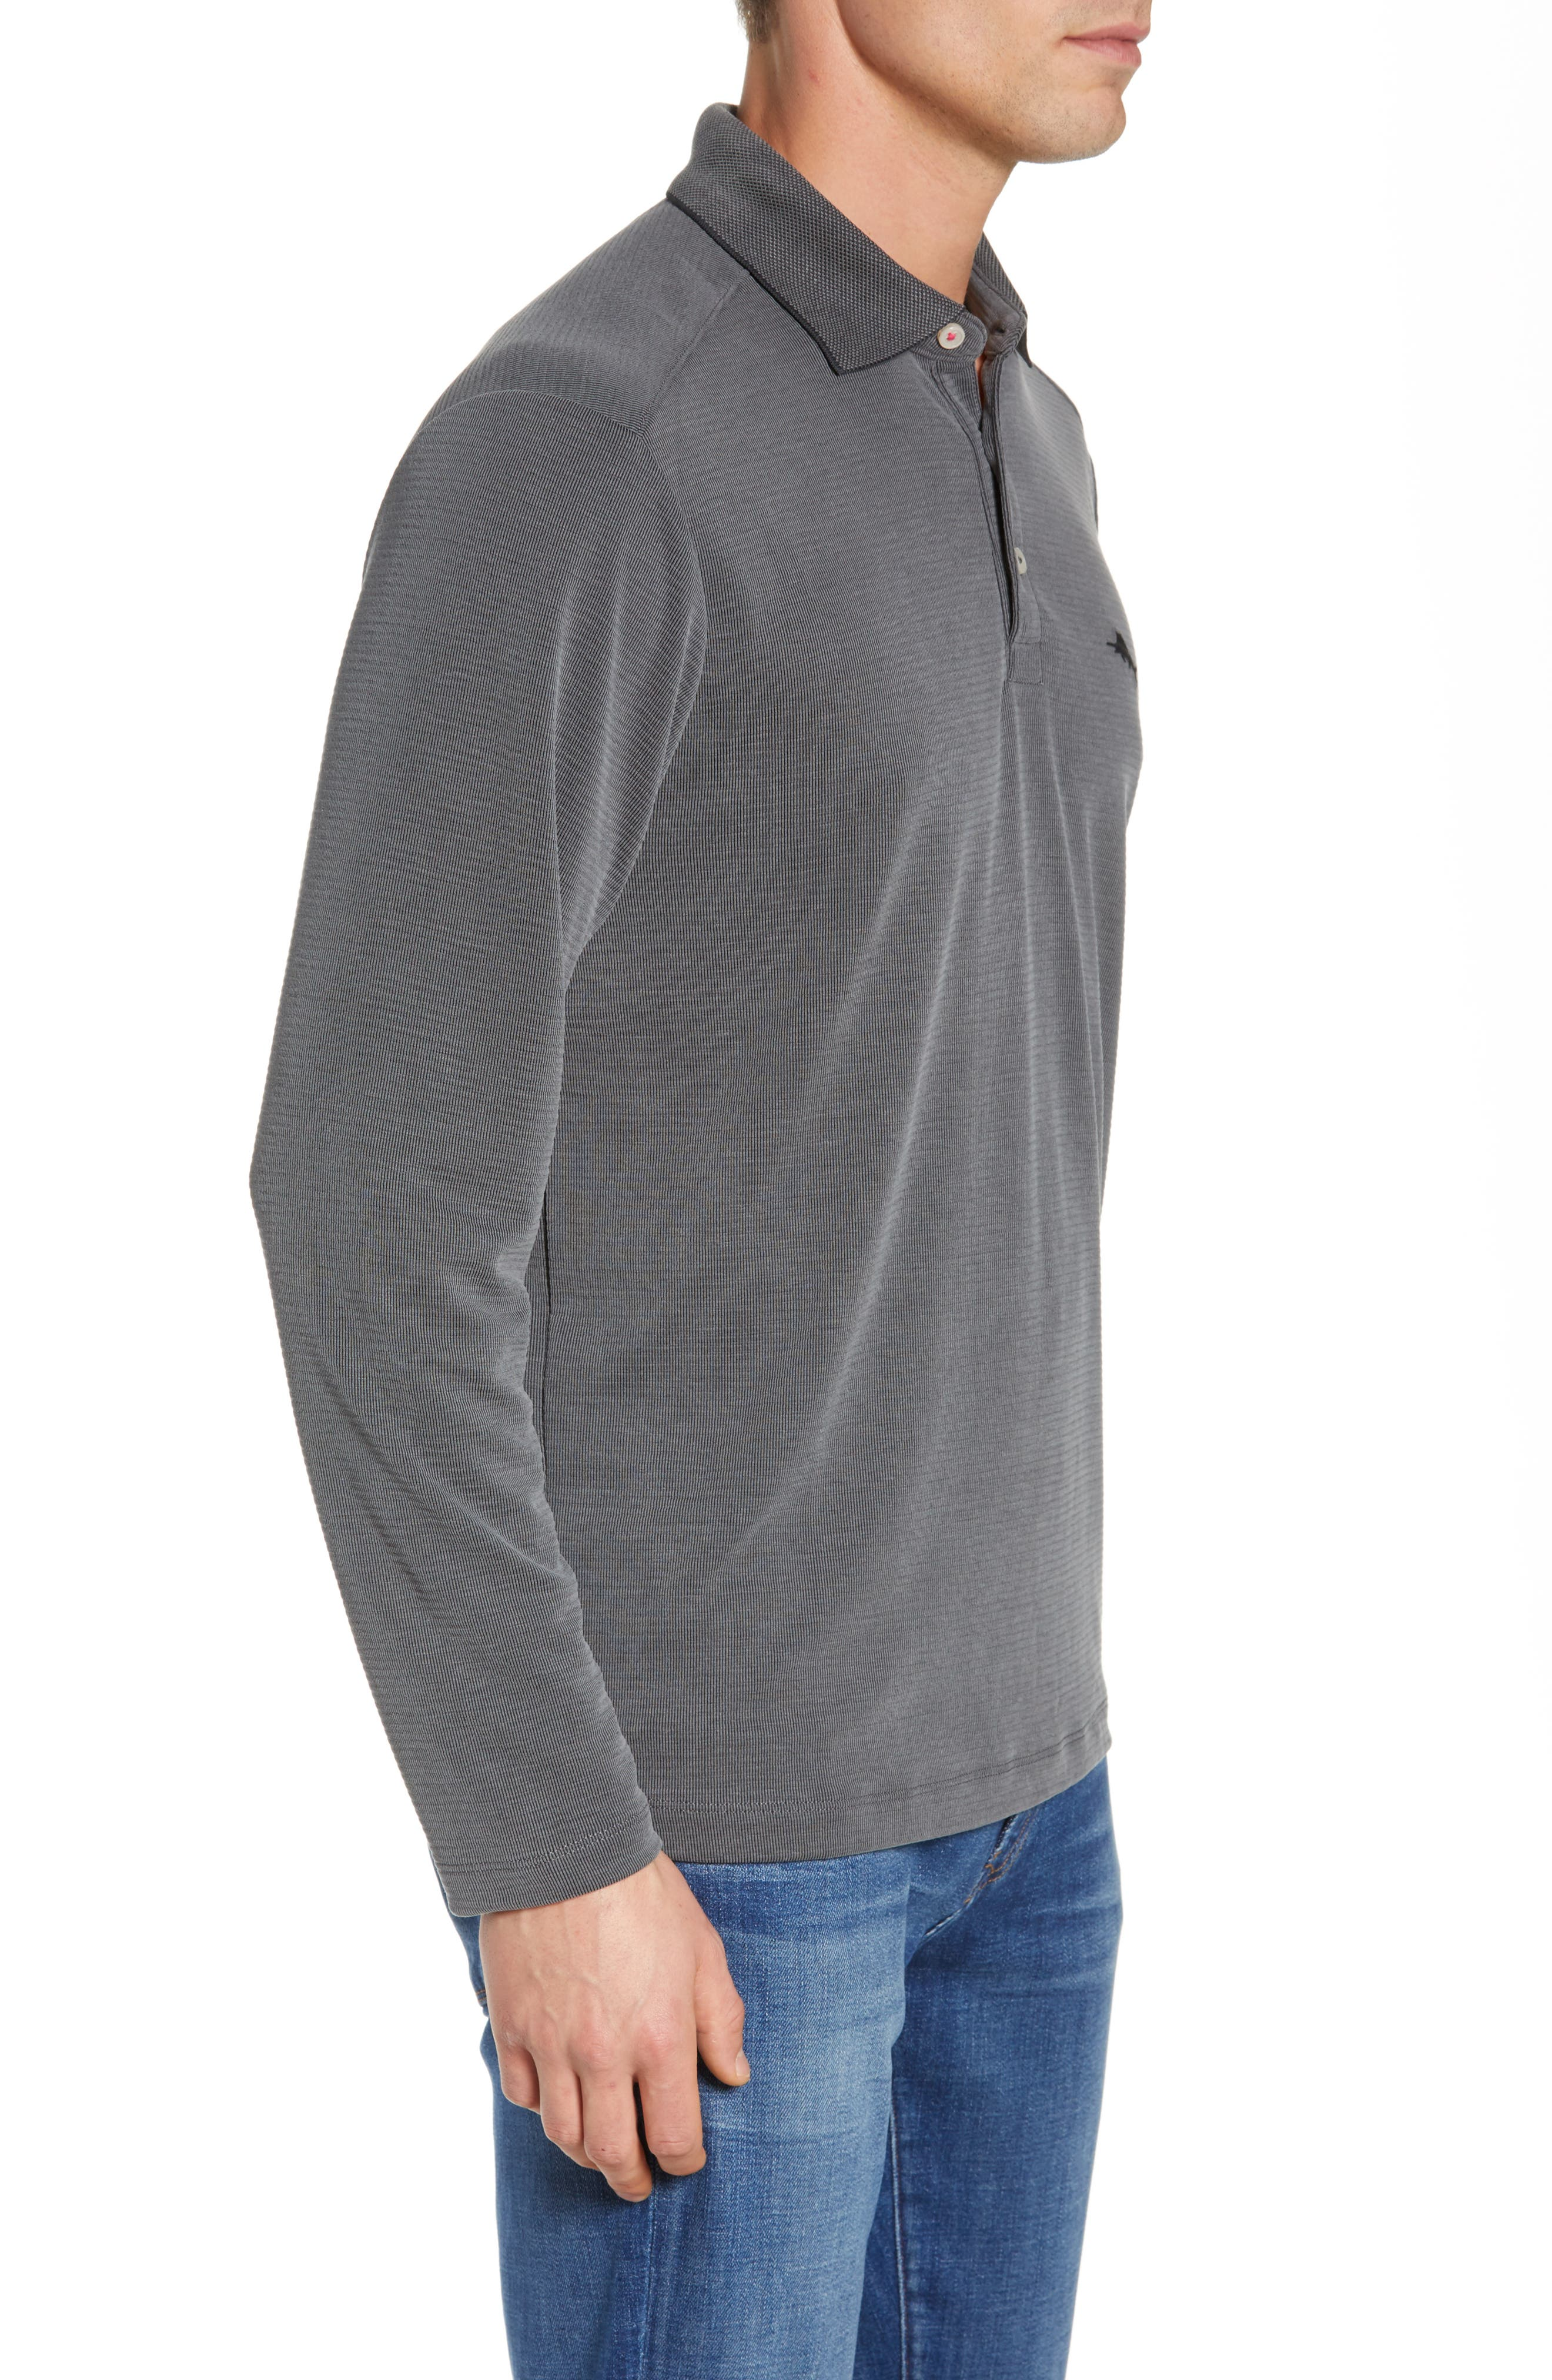 TOMMY BAHAMA, Coastal Crest Regular Fit Polo, Alternate thumbnail 3, color, BLACK